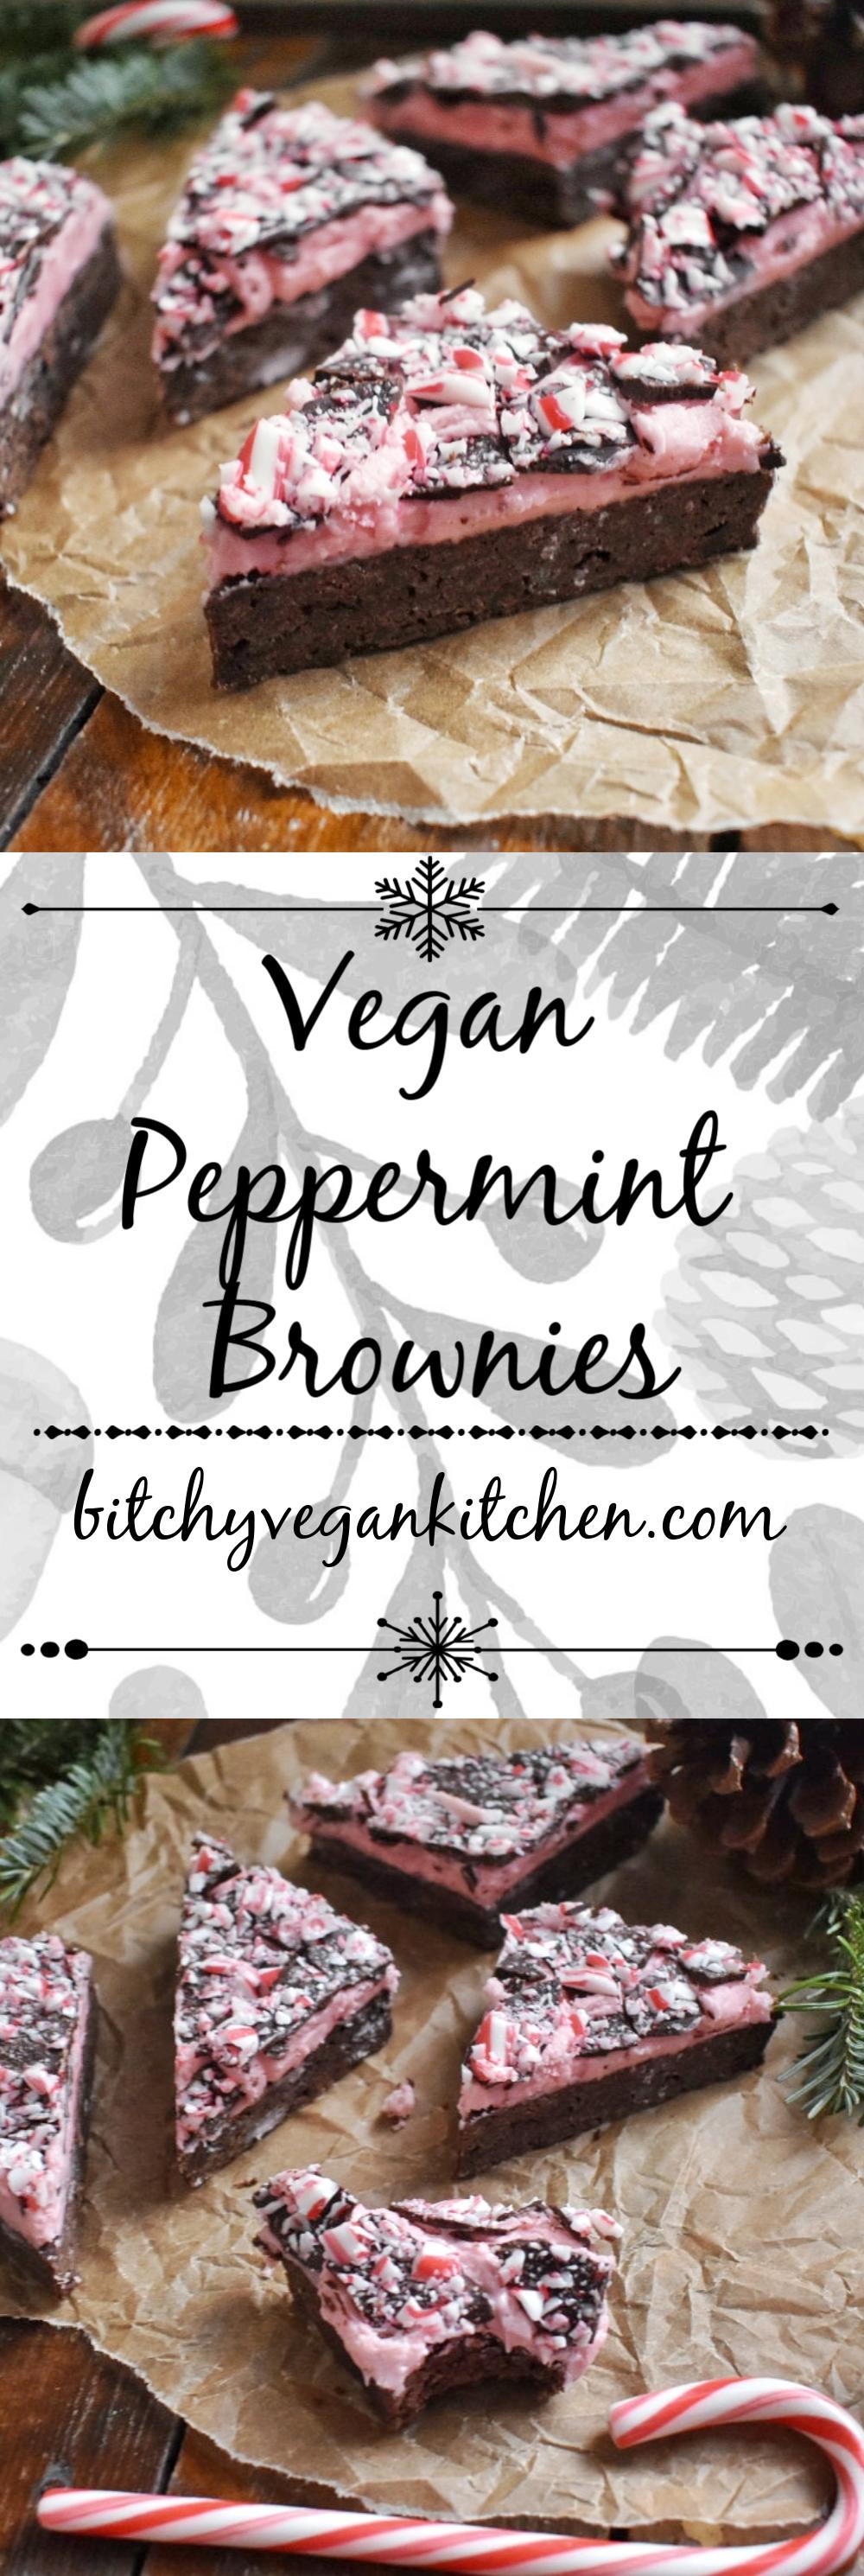 Vegan Peppermint Brownies - The Bitchy Baker